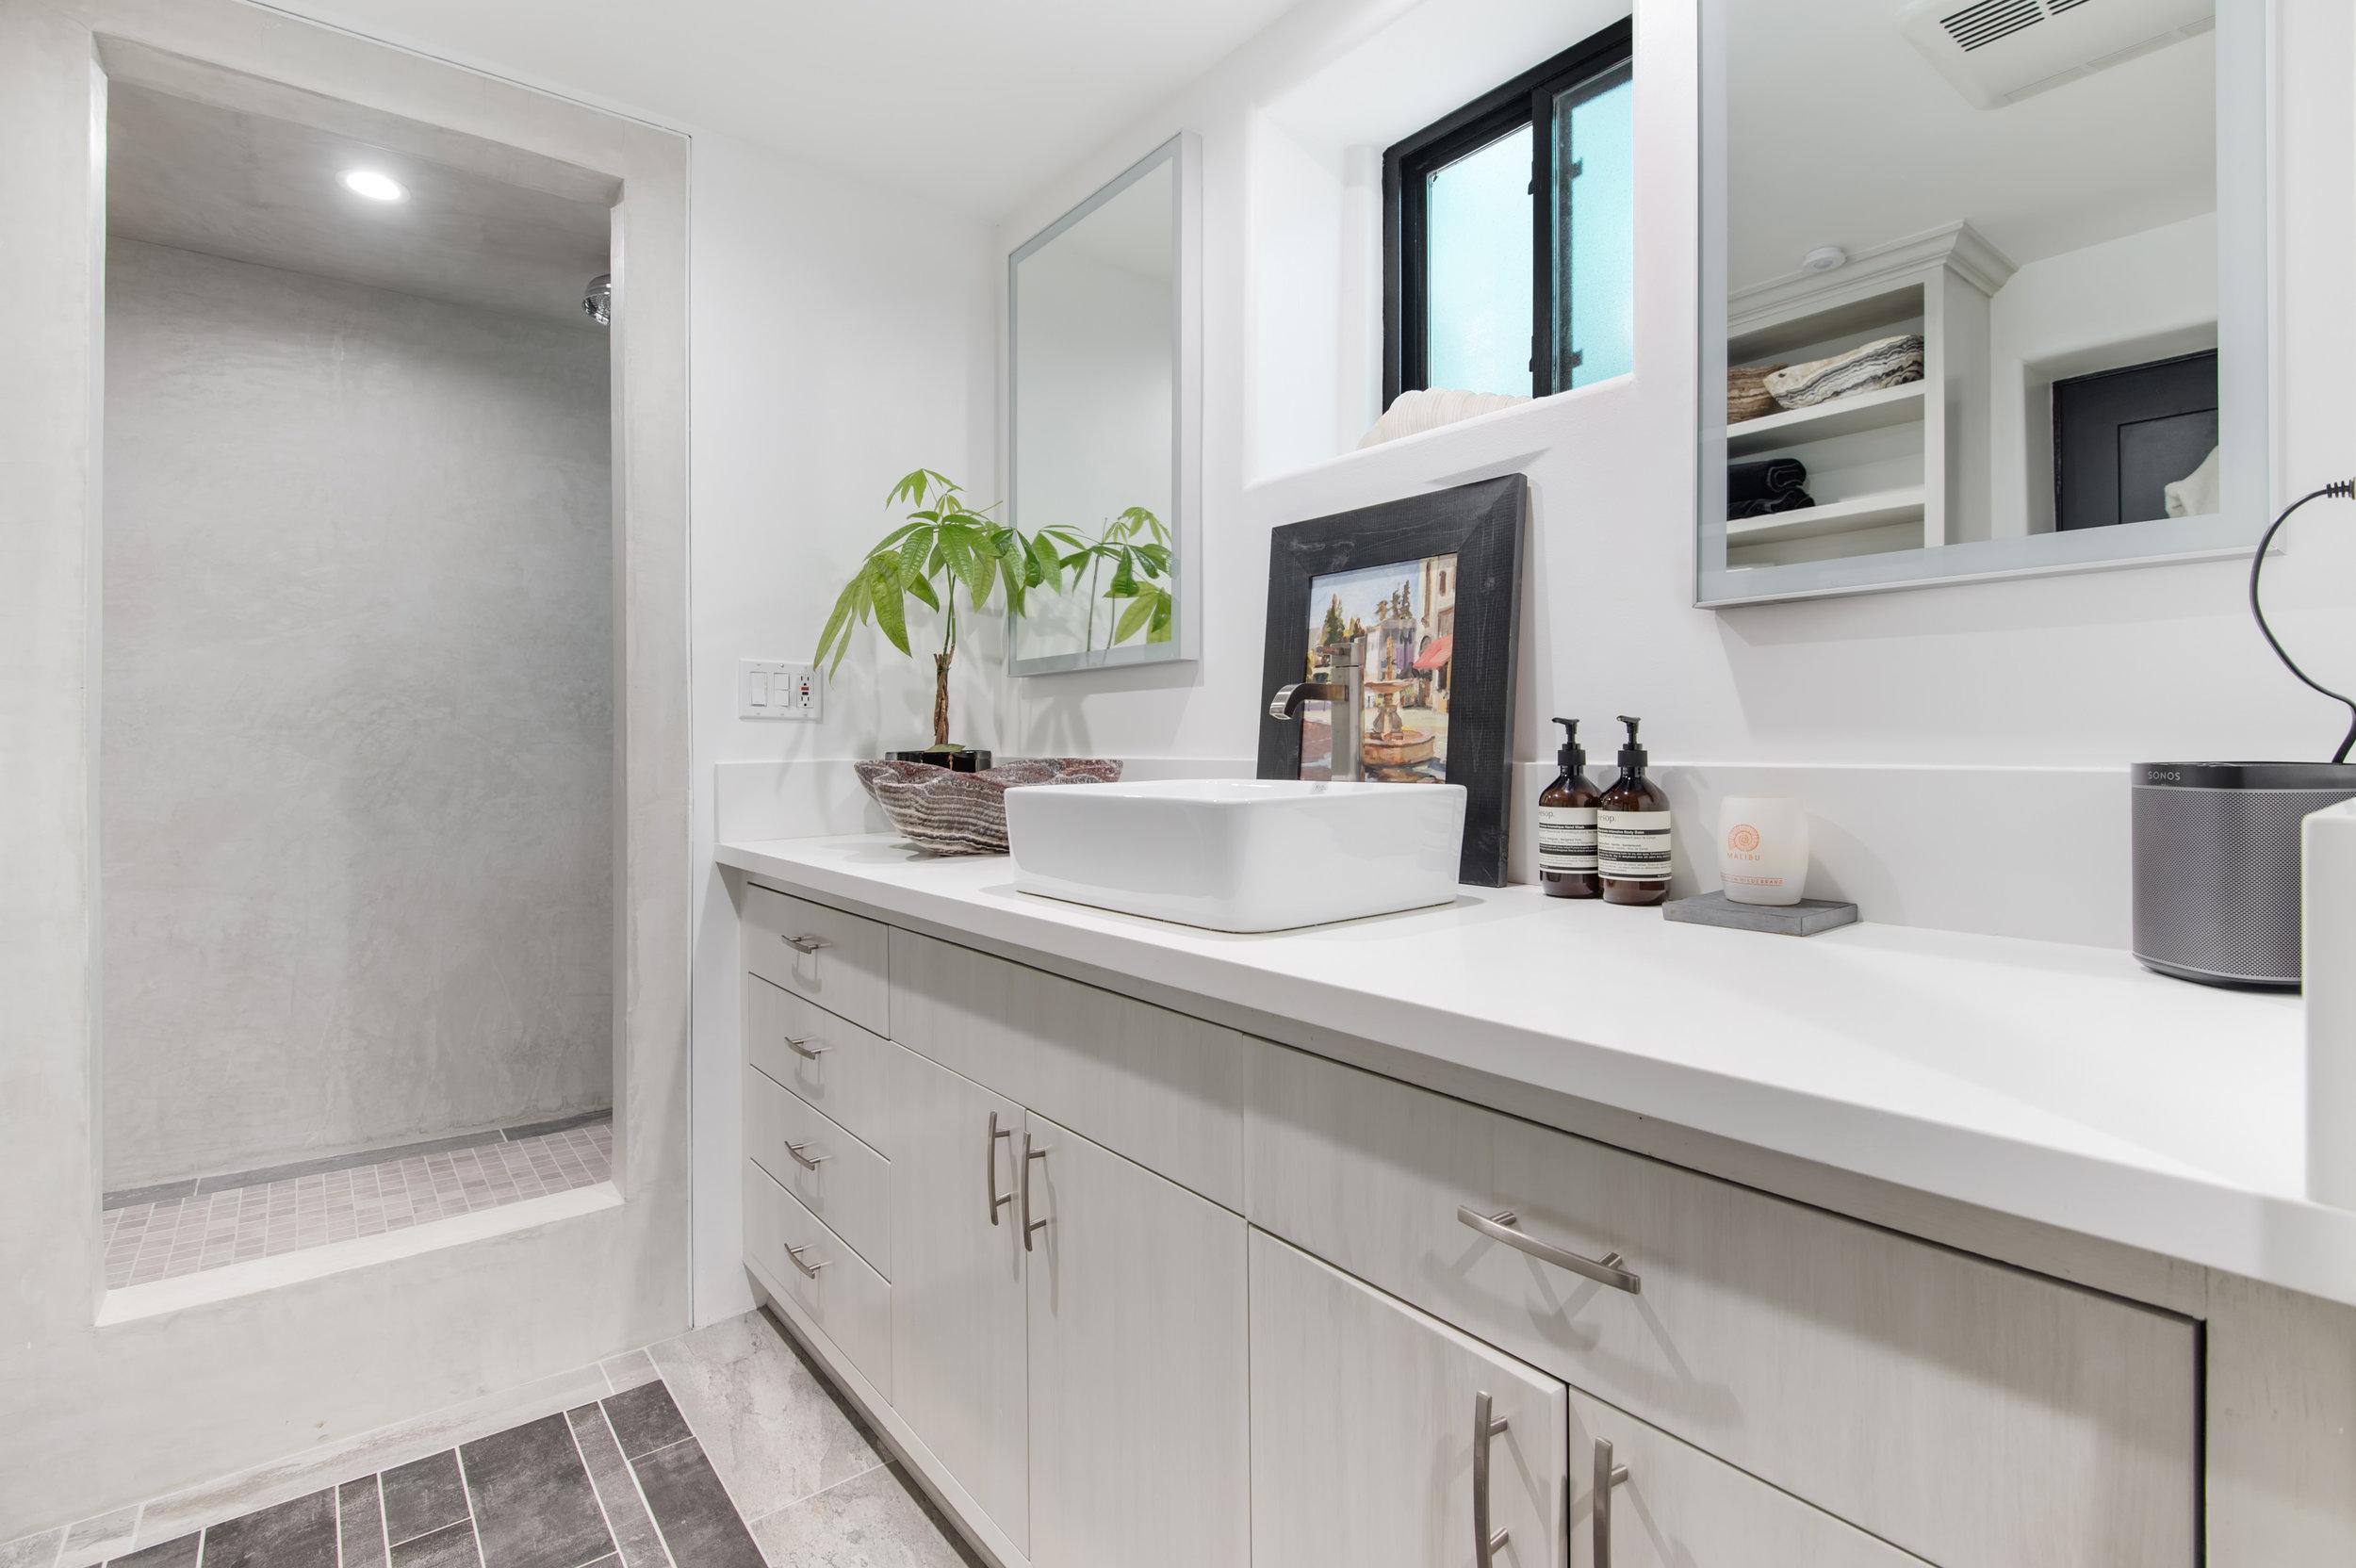 026 Bathroom 26272 Cool Glen Way Malibu For Sale Luxury Real Estate.jpg